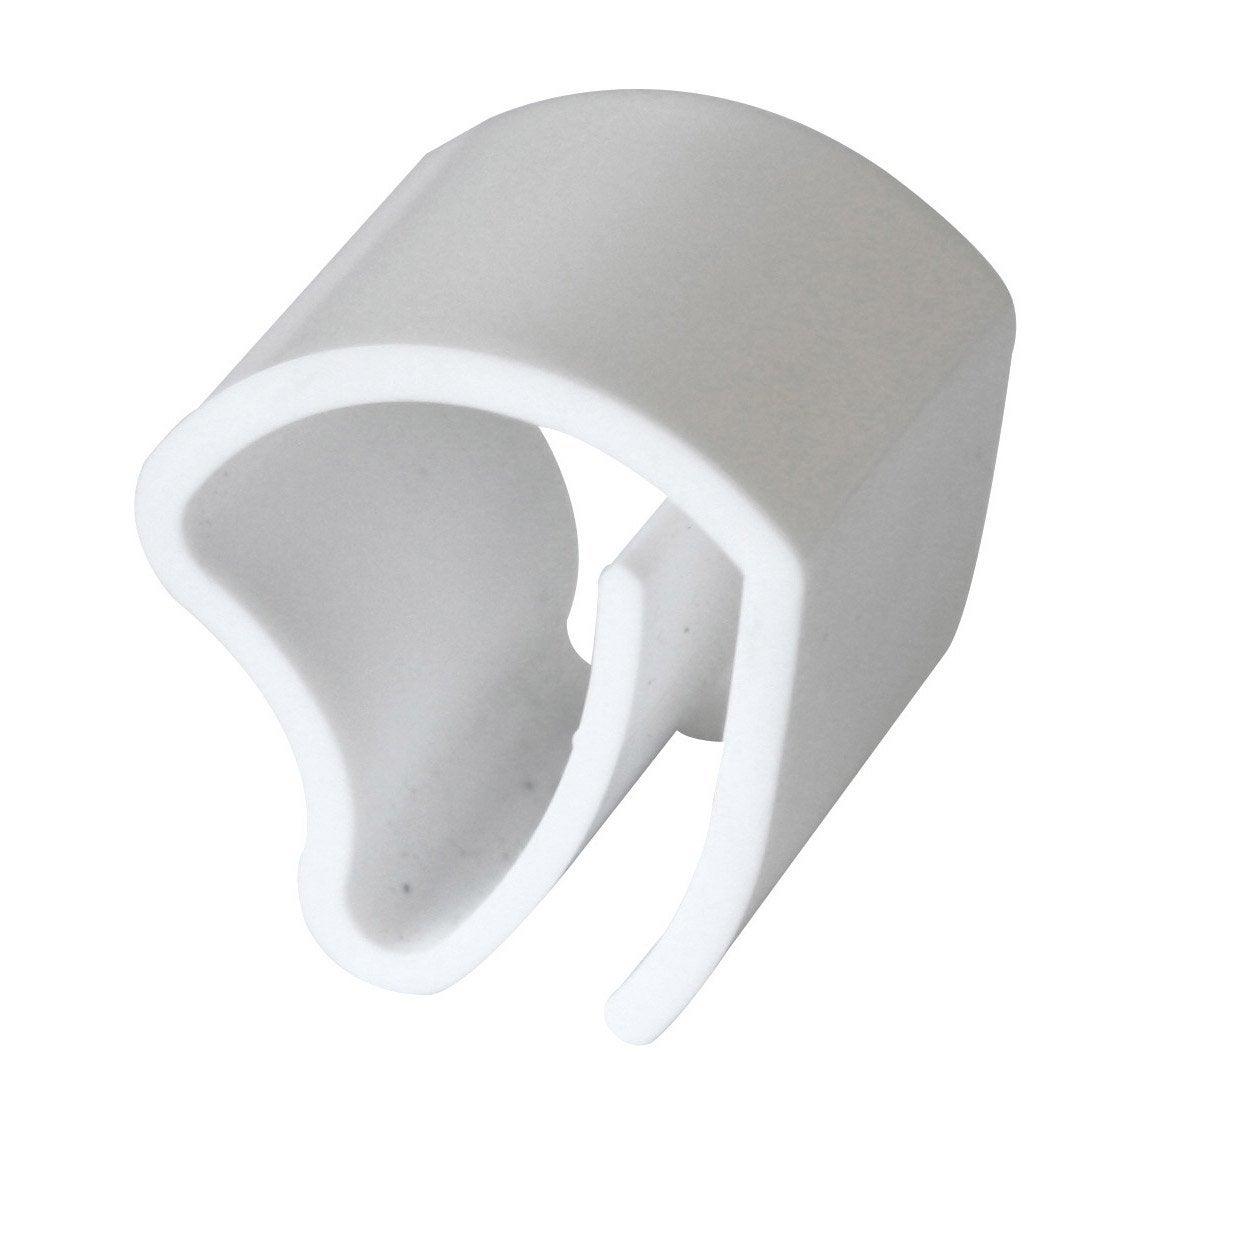 lot de 3 supports de fixation inspire aluminium leroy merlin. Black Bedroom Furniture Sets. Home Design Ideas